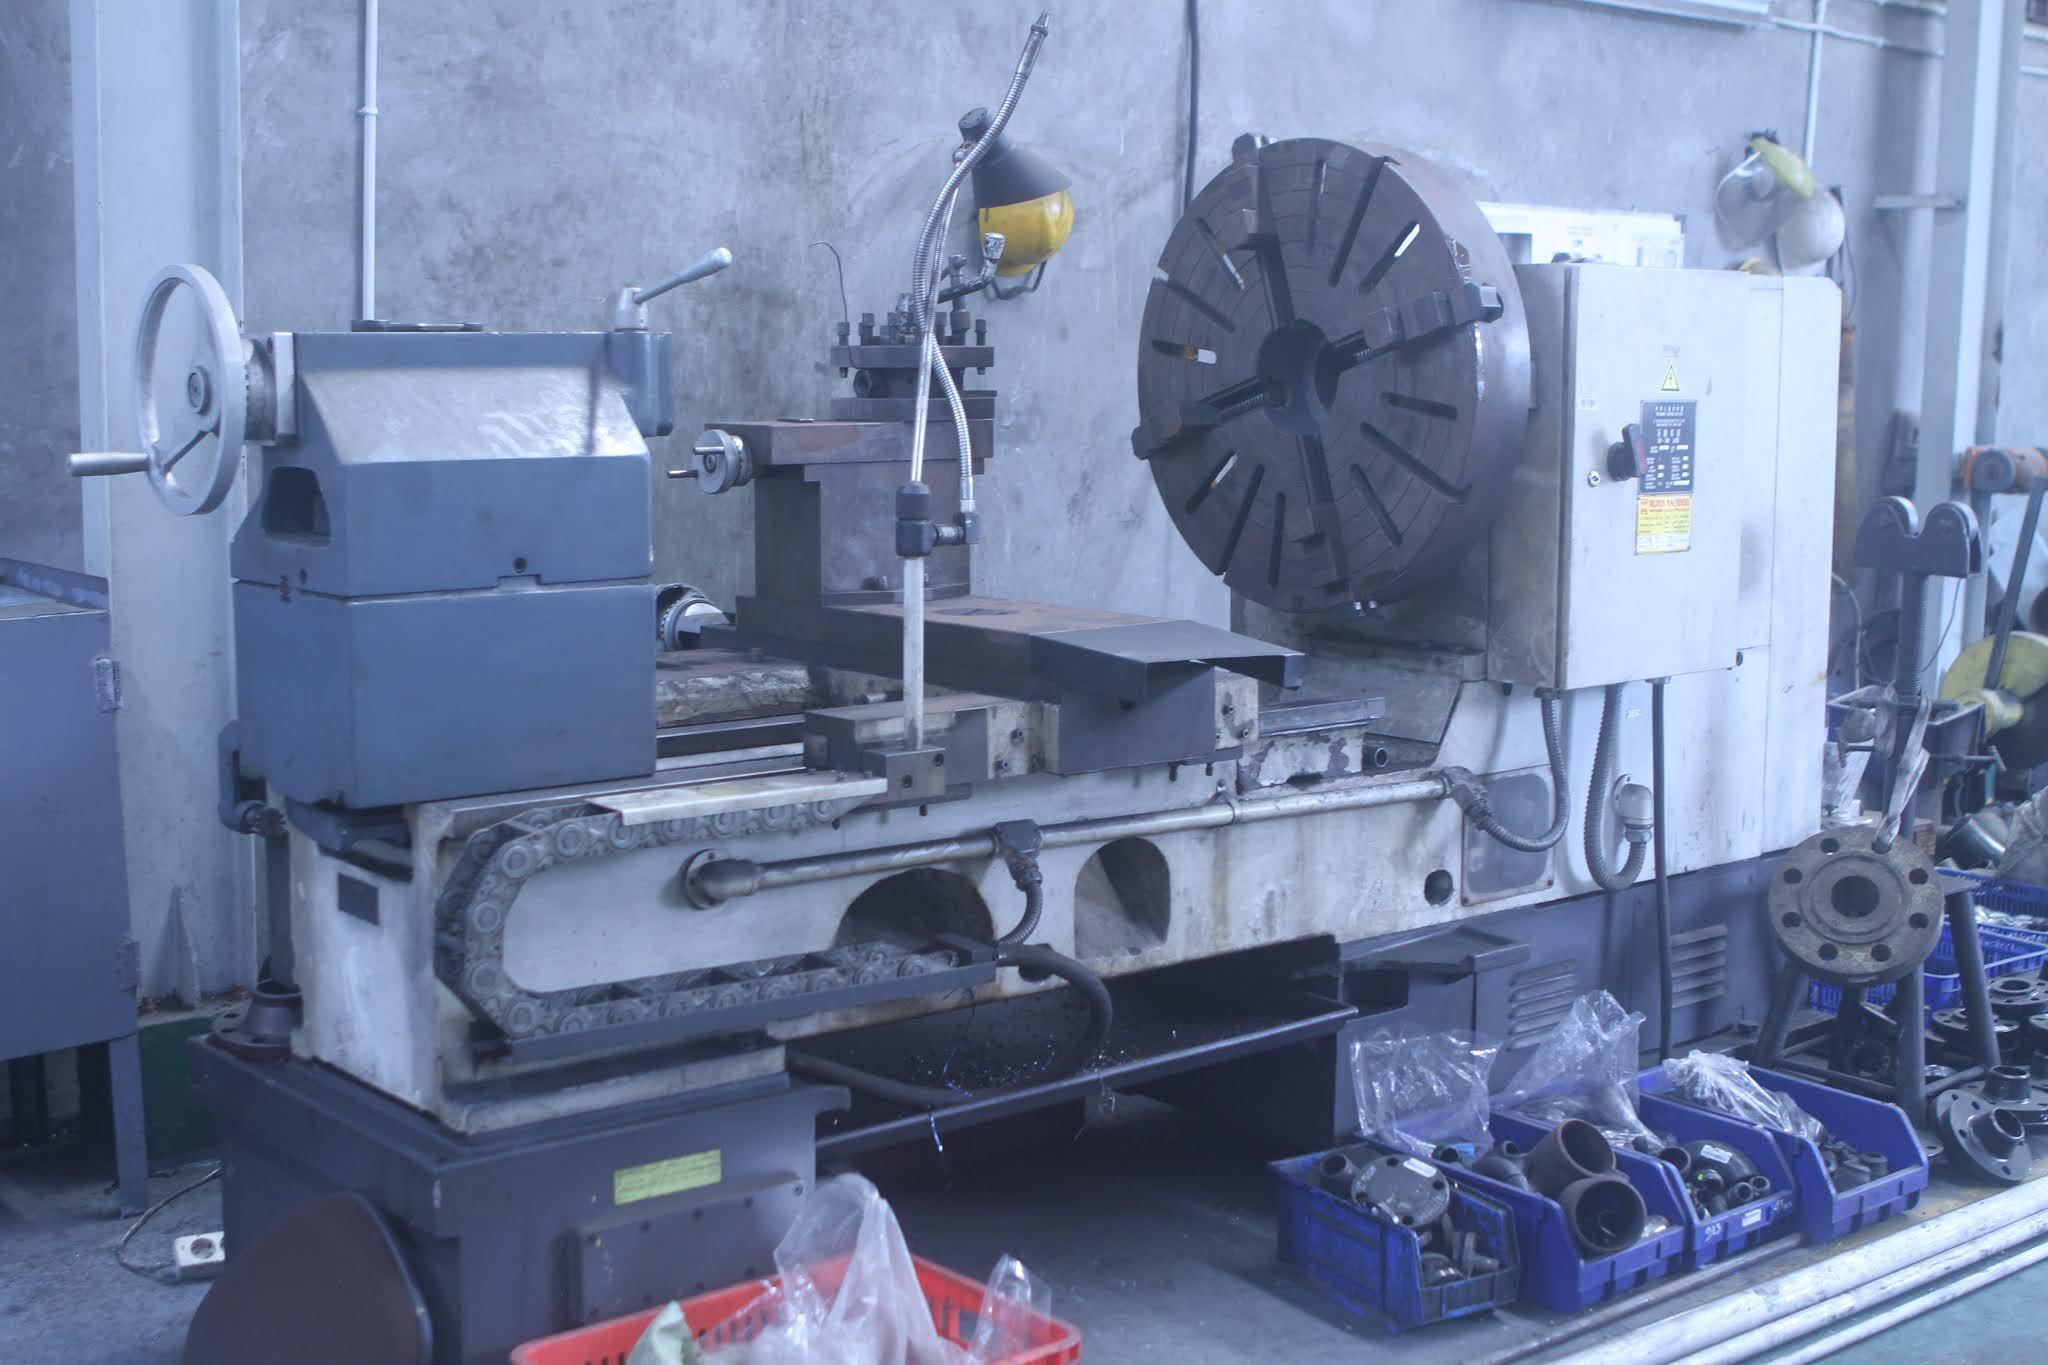 jasa machining flange taper schedule cuci drat ulir pipa